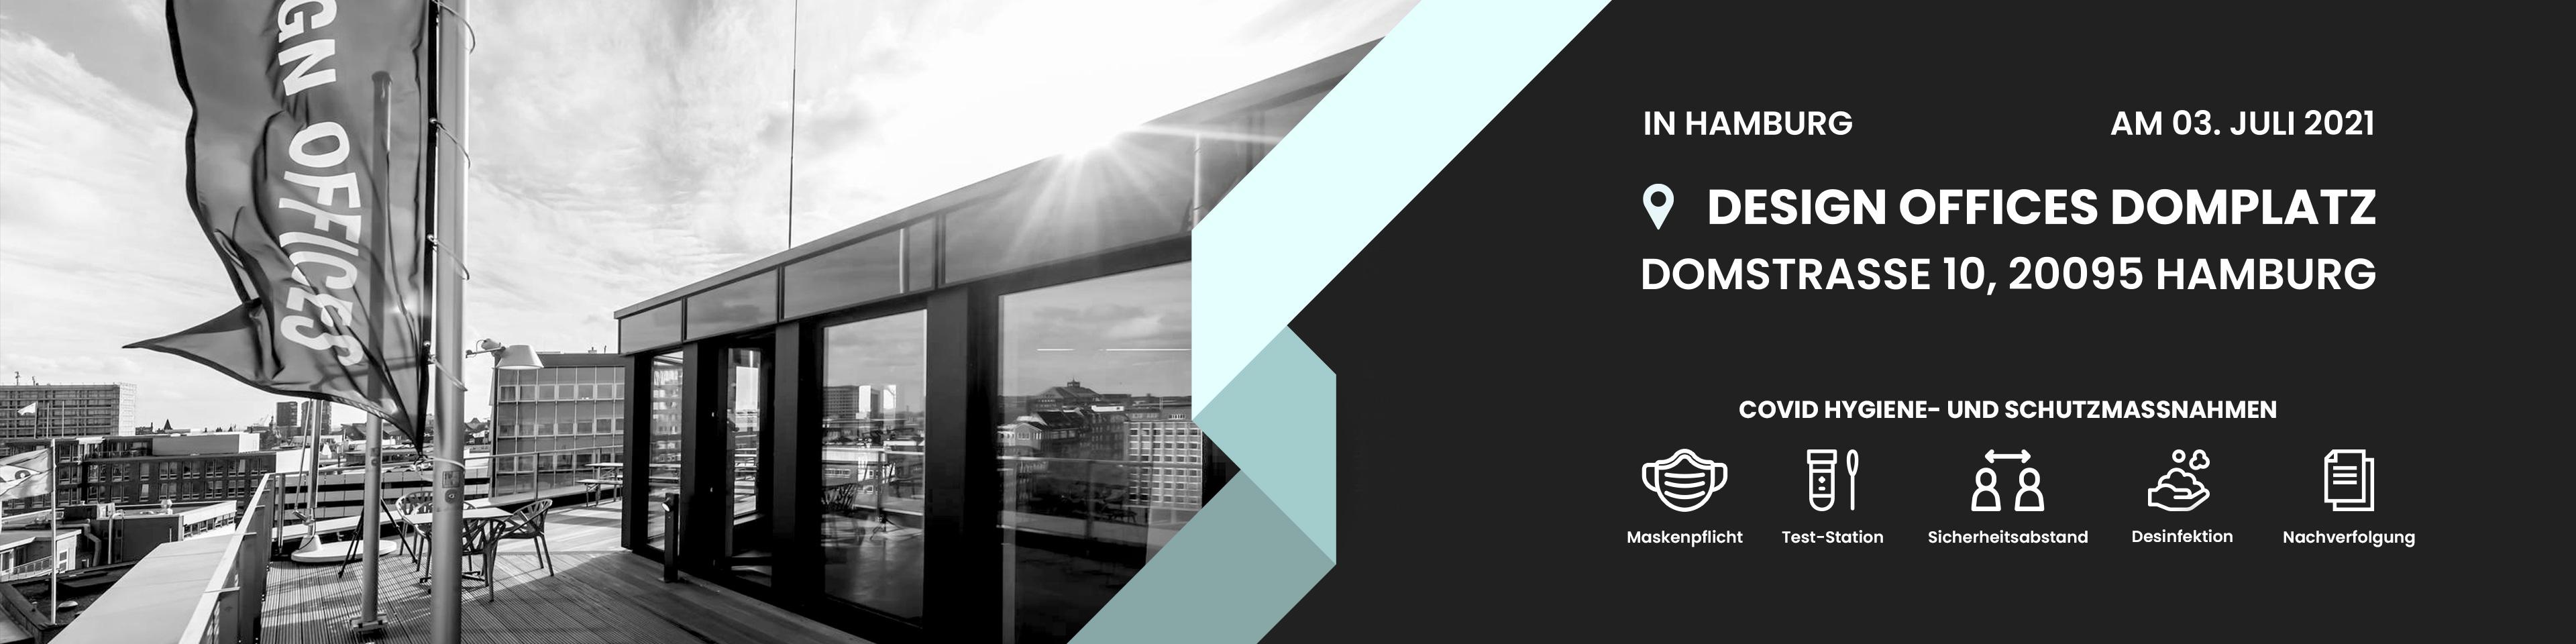 acteon_mdh-workshop_describtion-image_3840x960_03.2